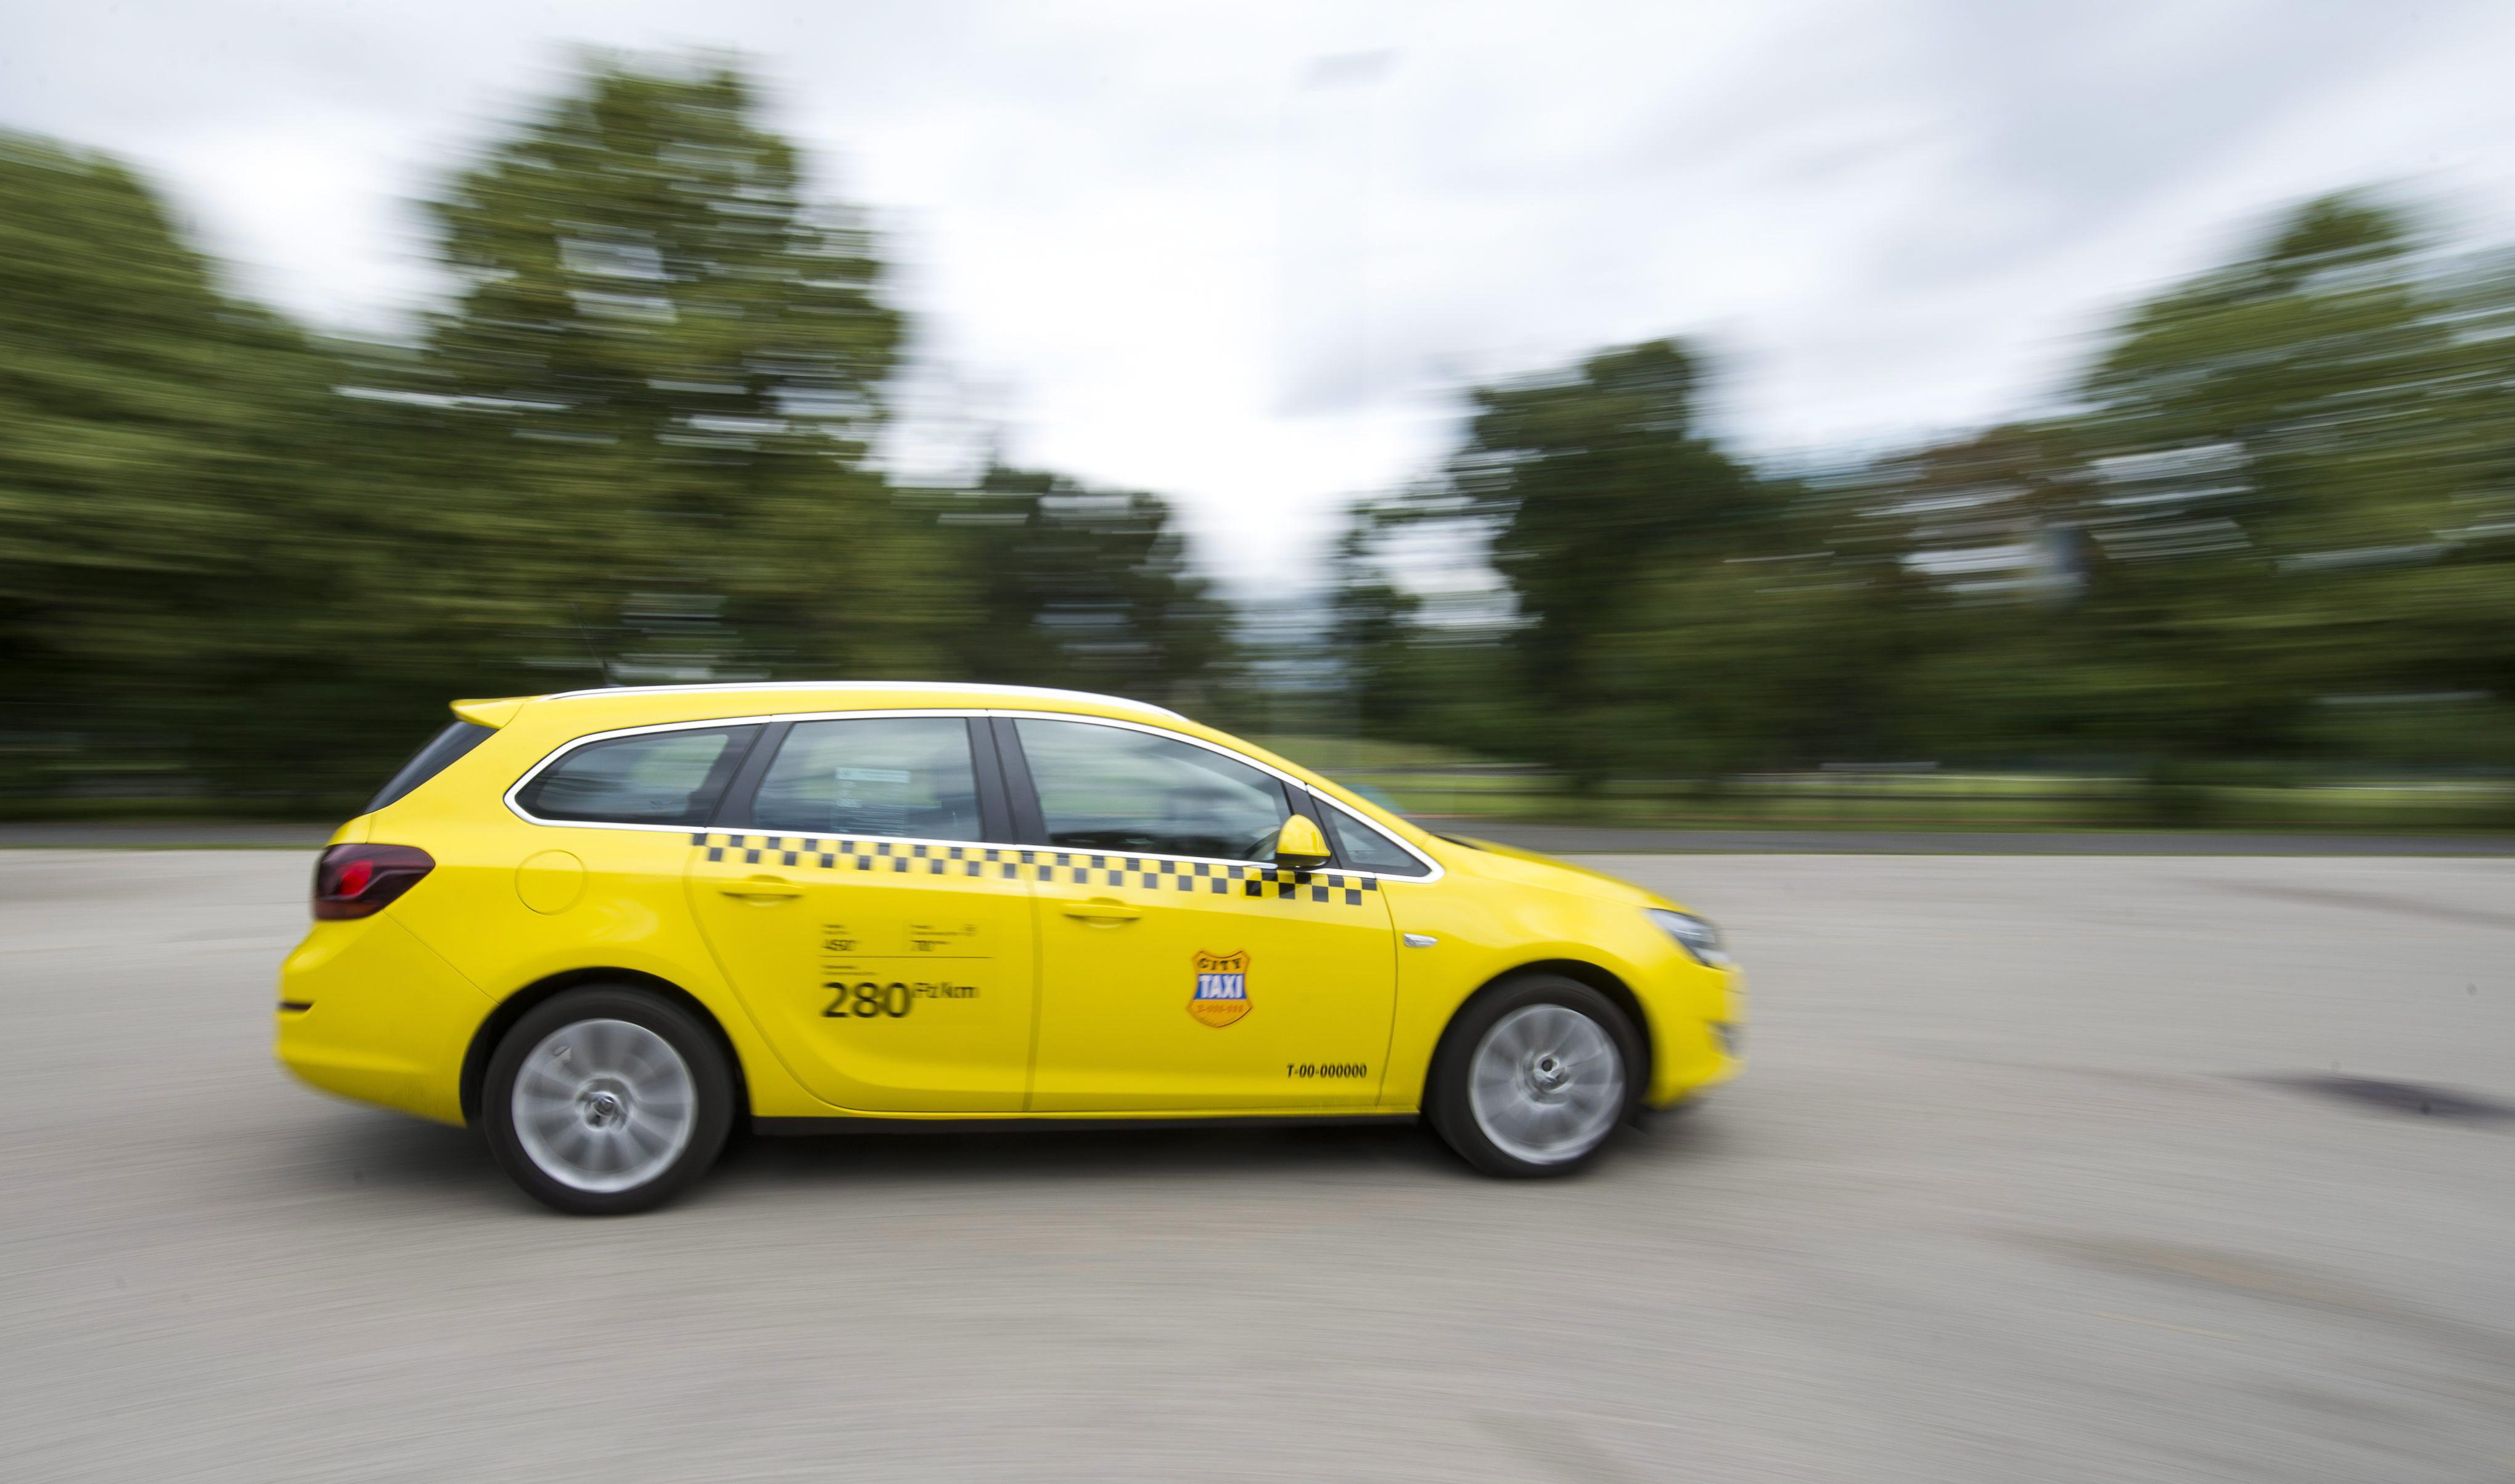 20140203sarga-taxi-illusztracio.jpg